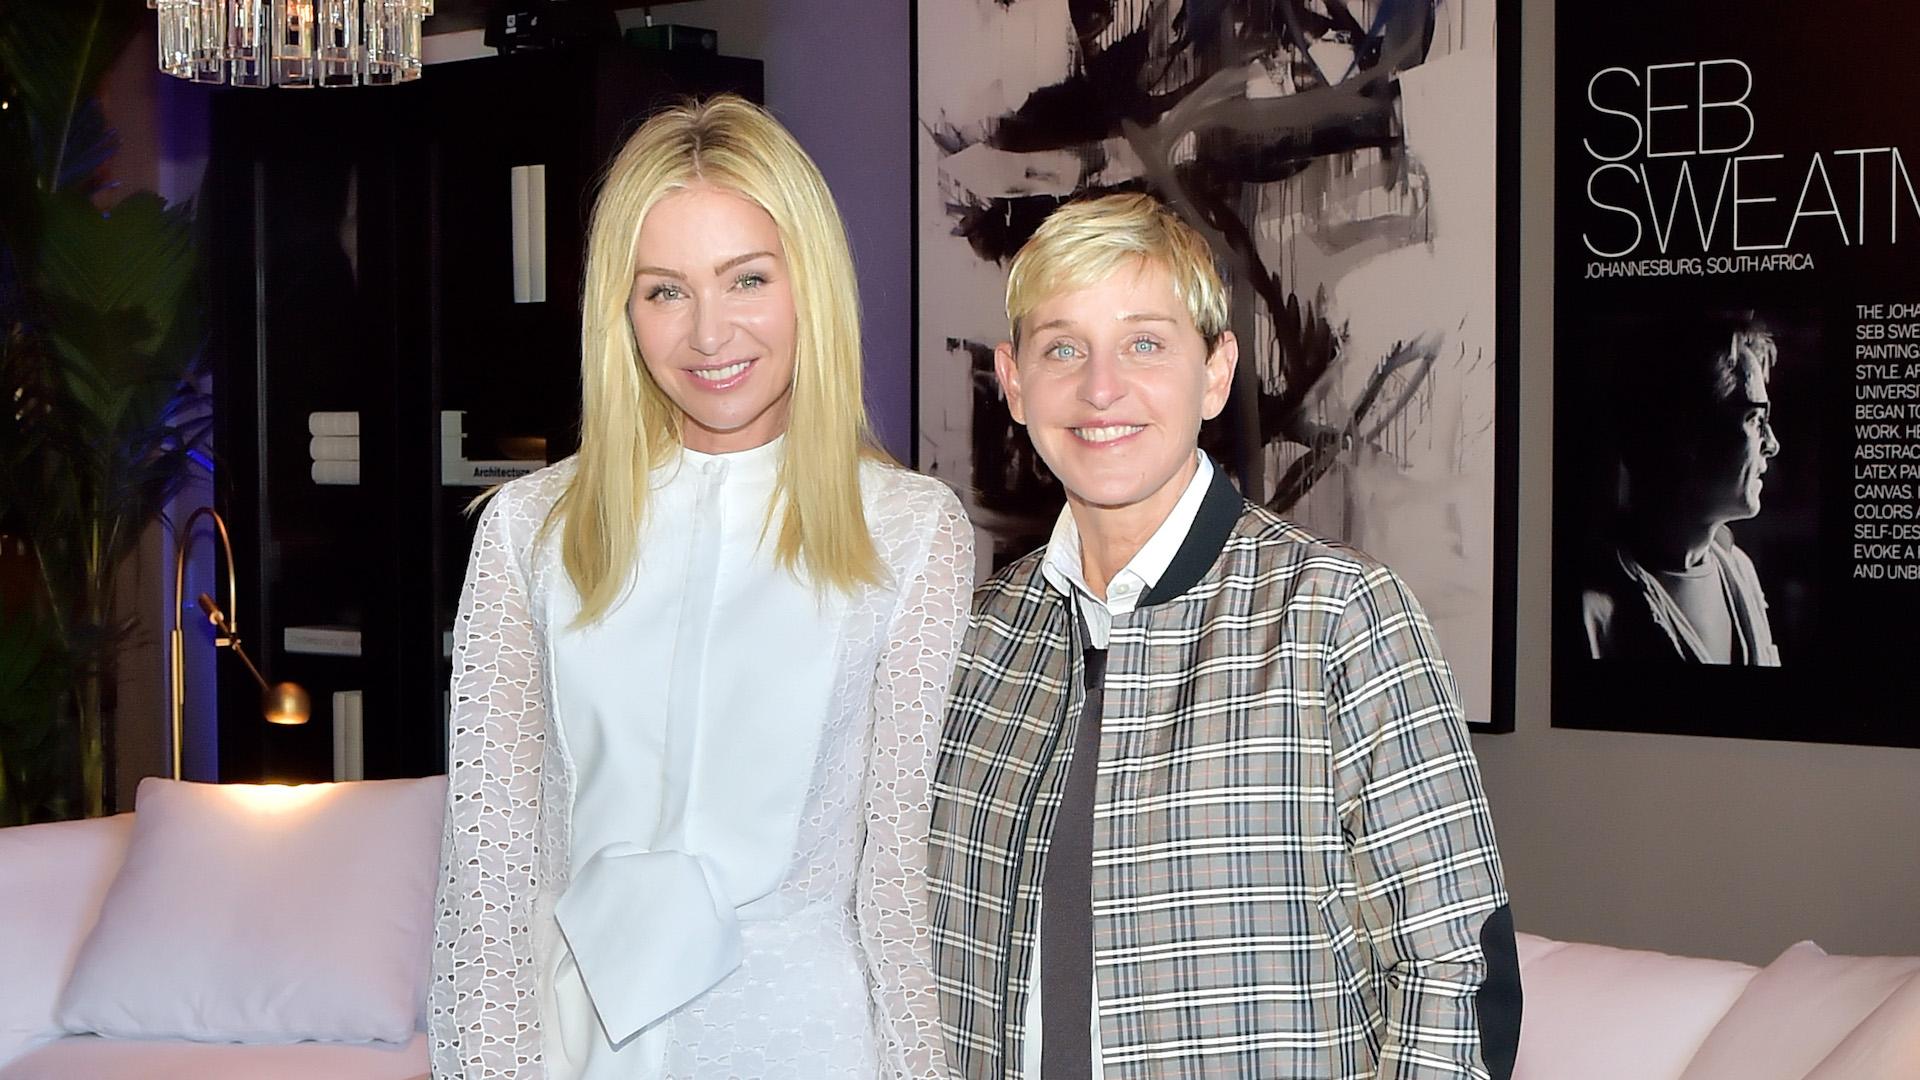 Ellen DeGeneres' 15th Anniversary Surprise Didn't Go As